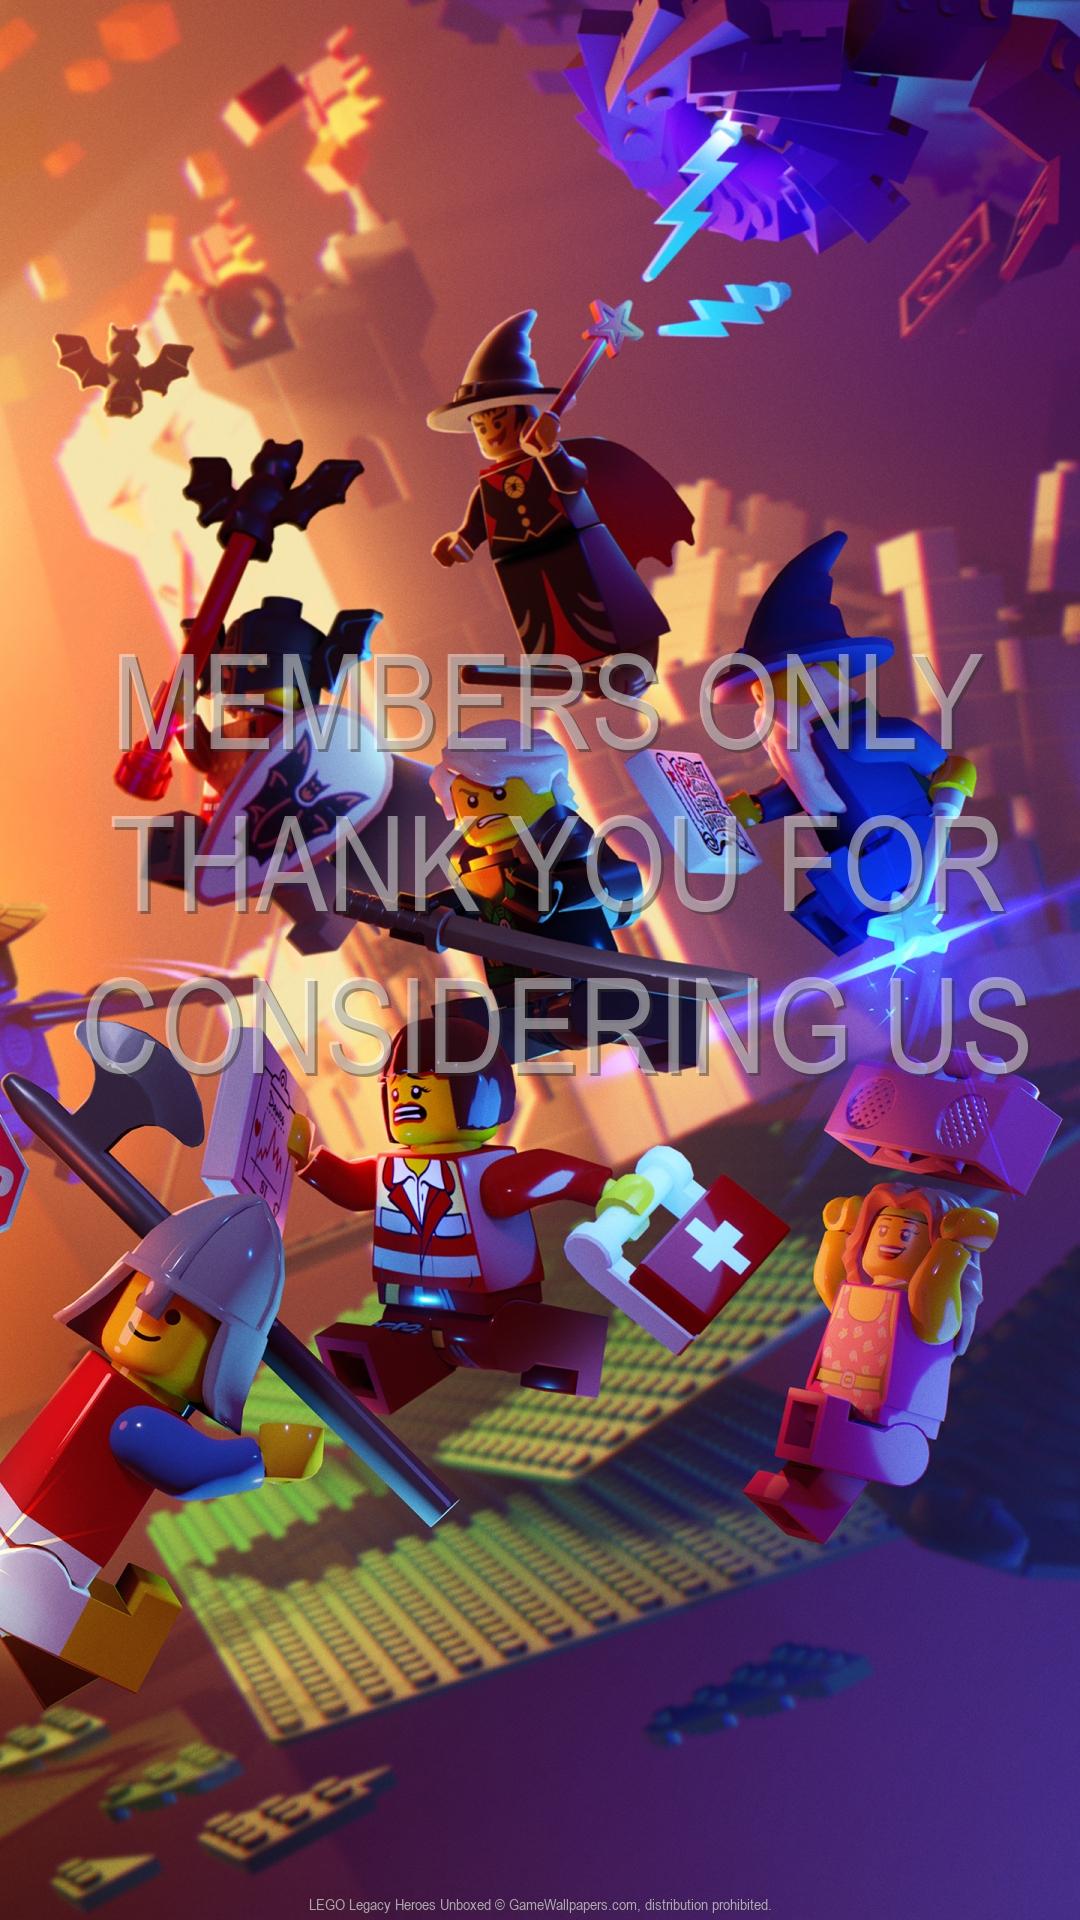 LEGO Legacy: Heroes Unboxed 1920x1080 Mobile fond d'écran 01